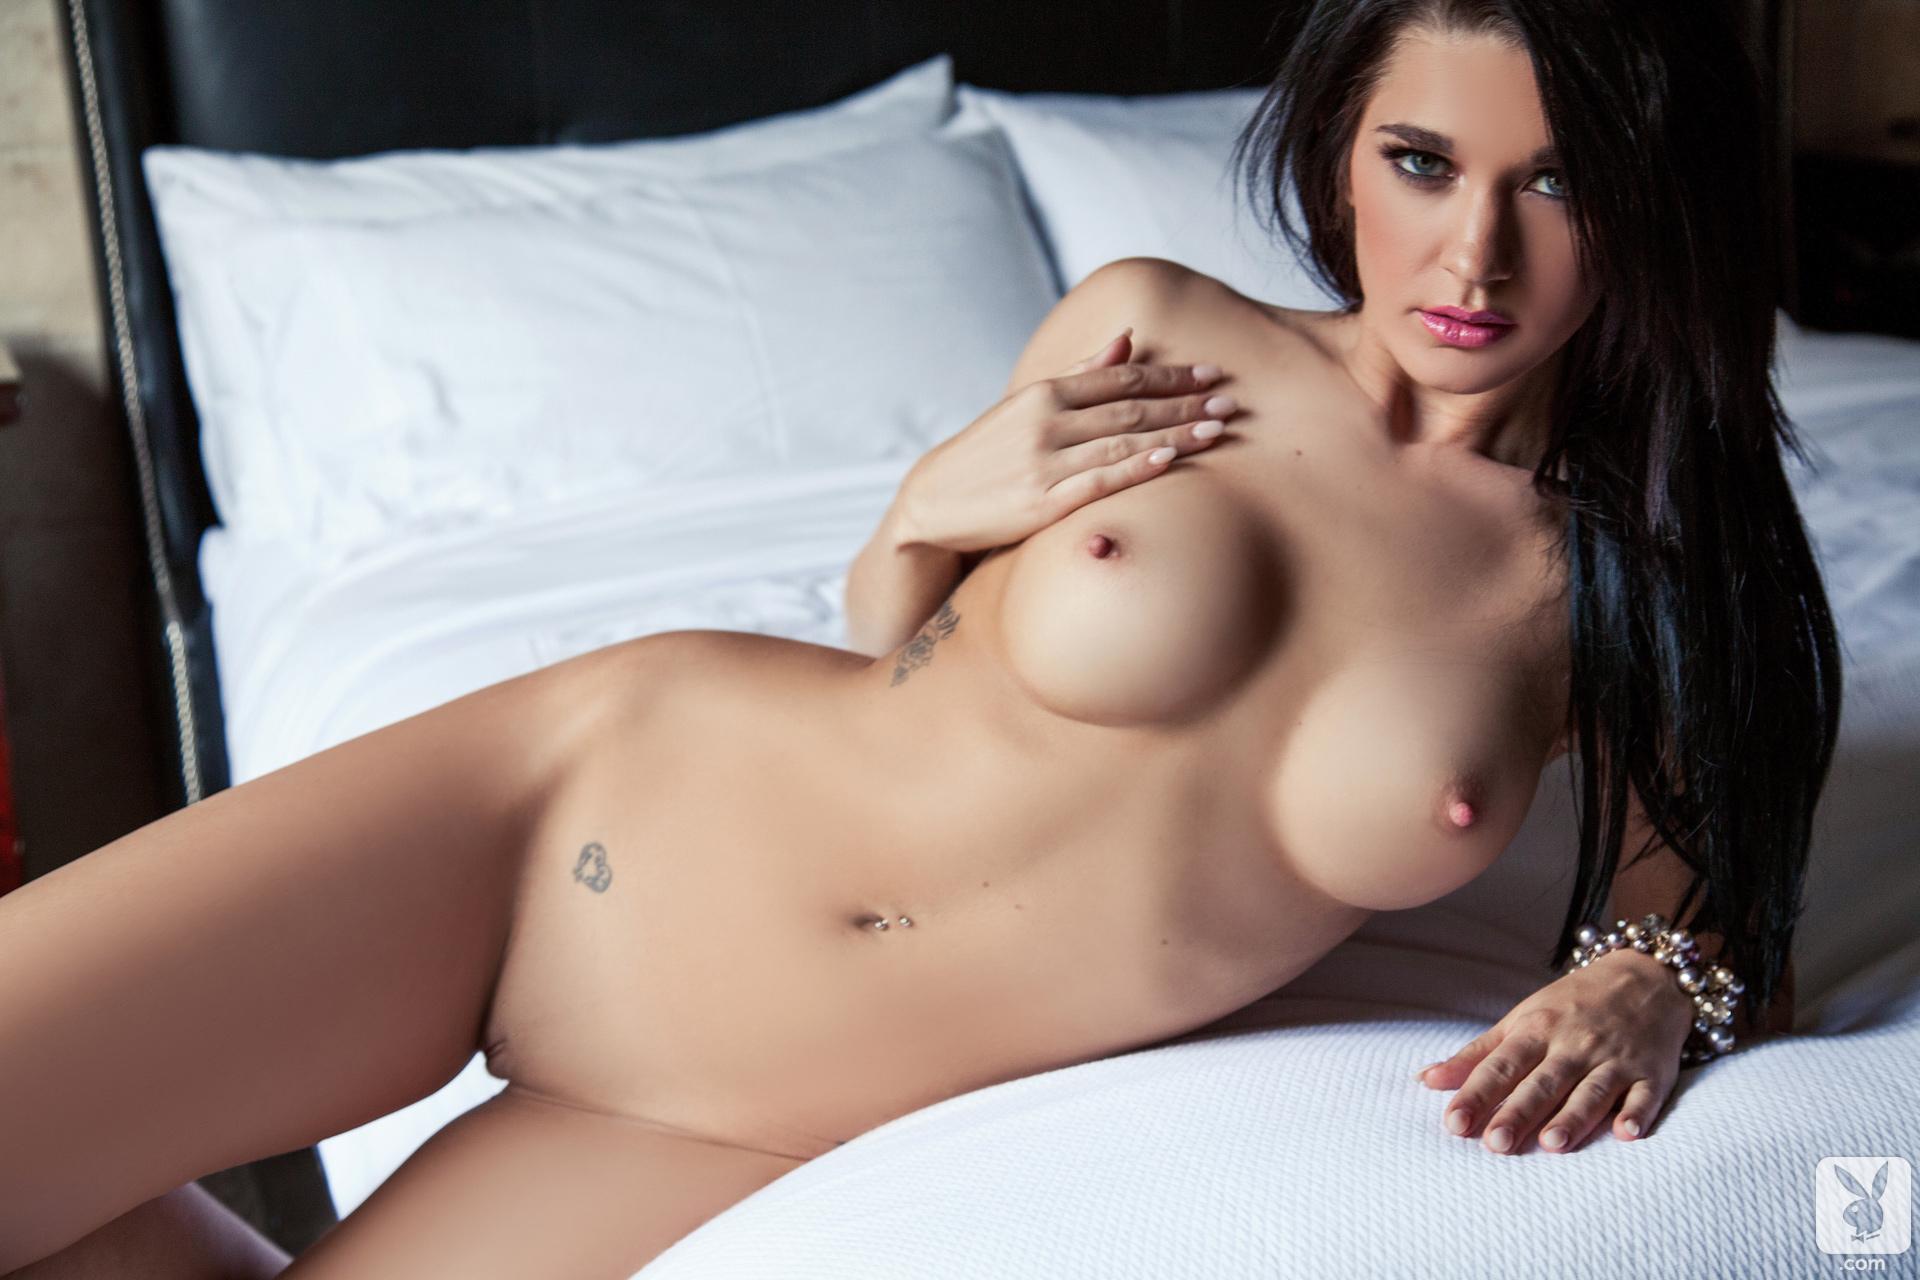 Nude women of canada